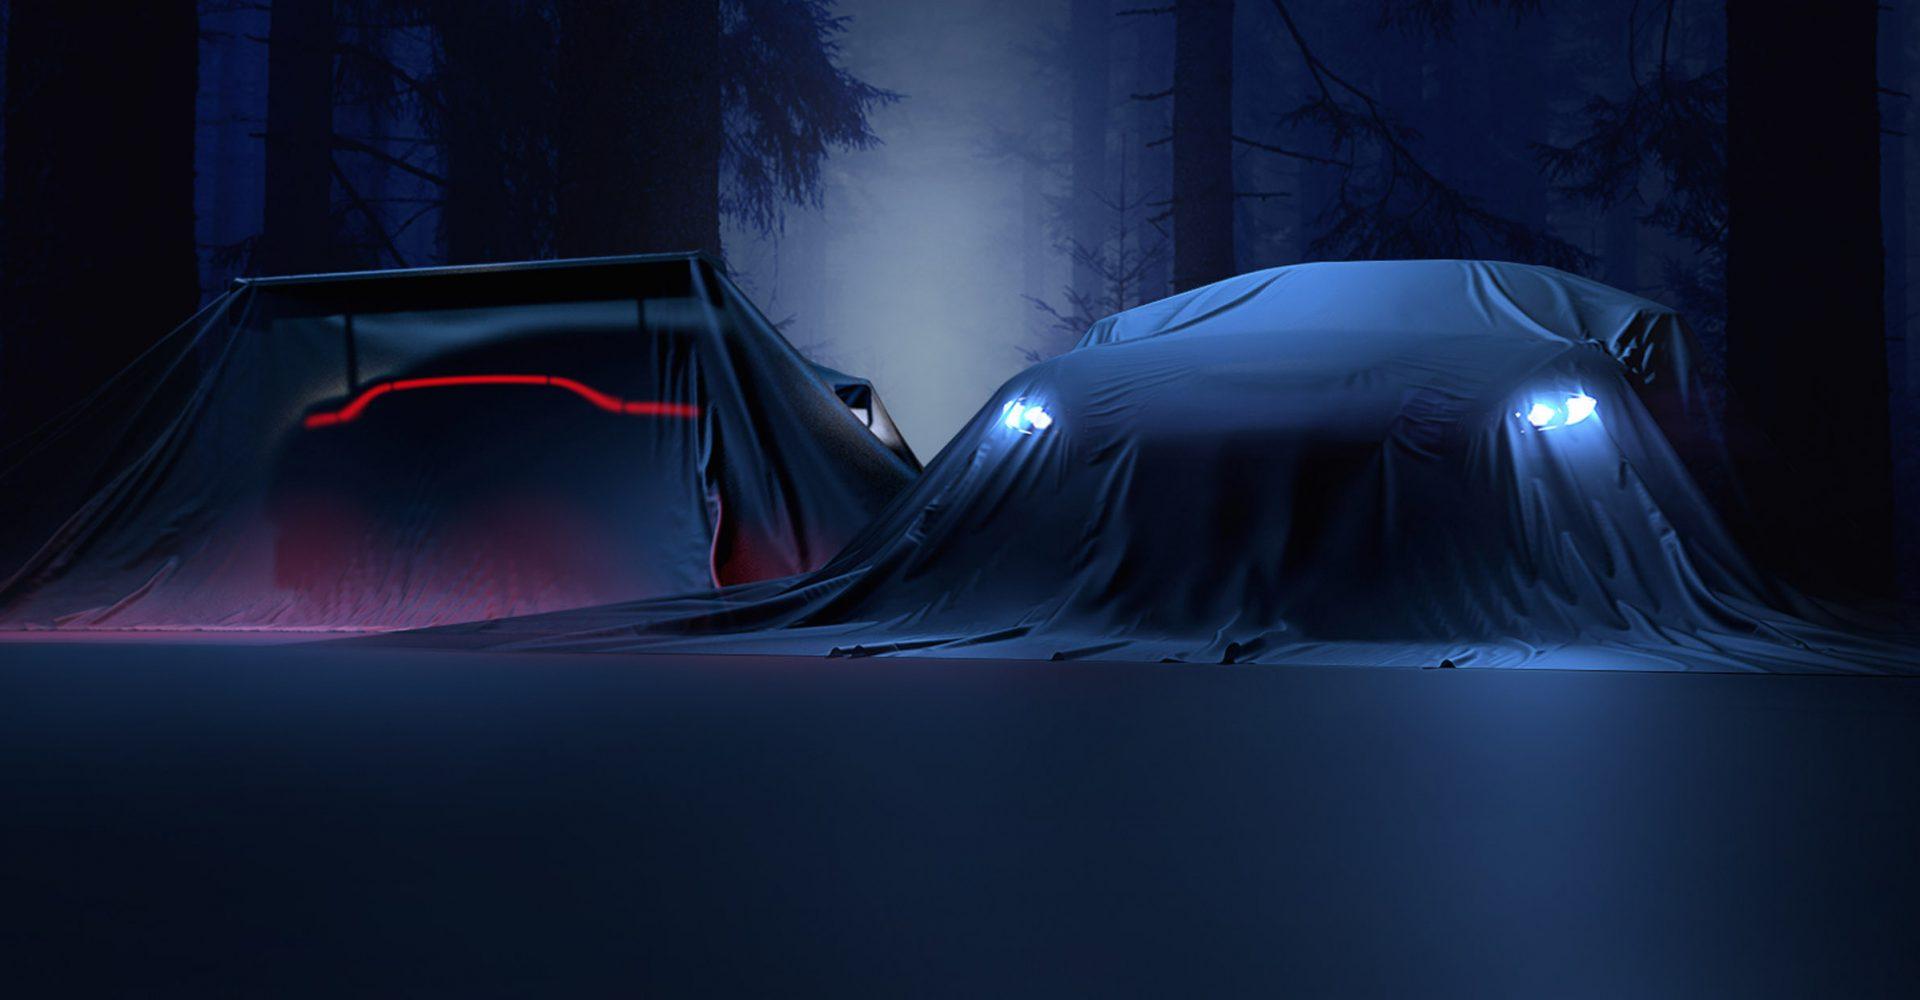 Aston Martin teases brand new Vantage